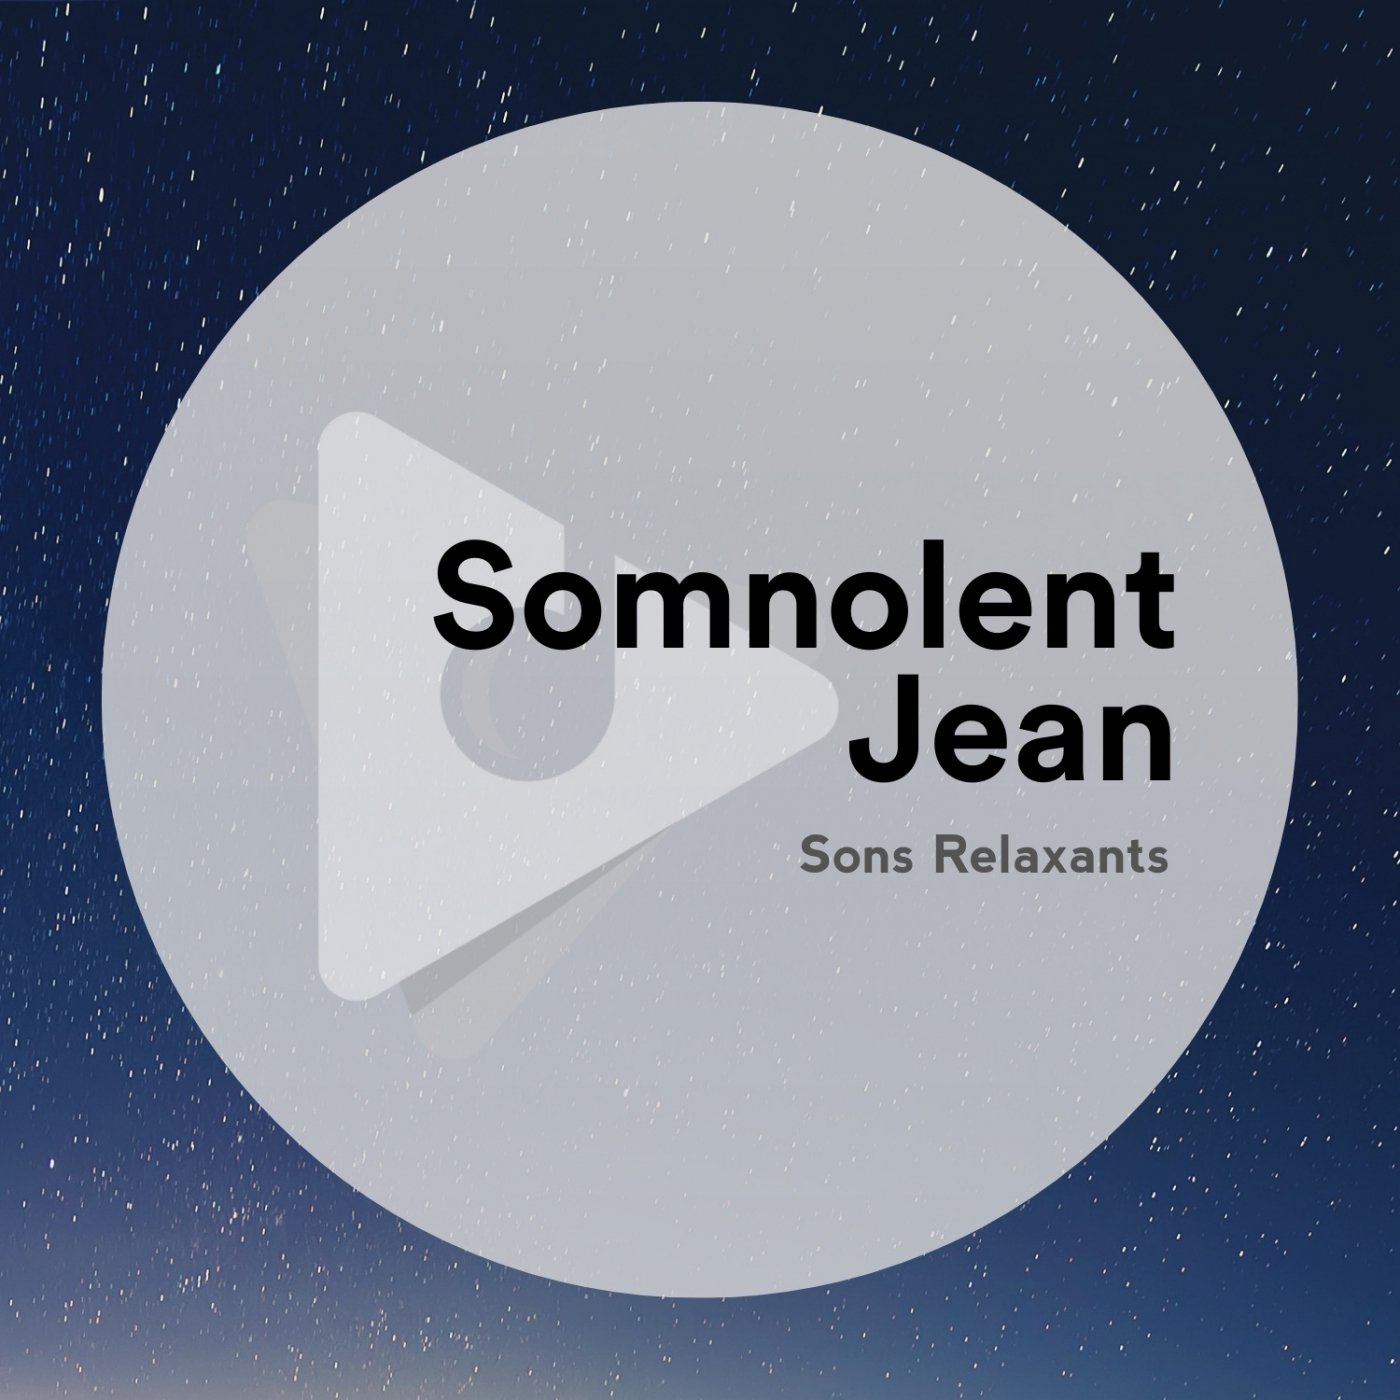 Somnolent Jean